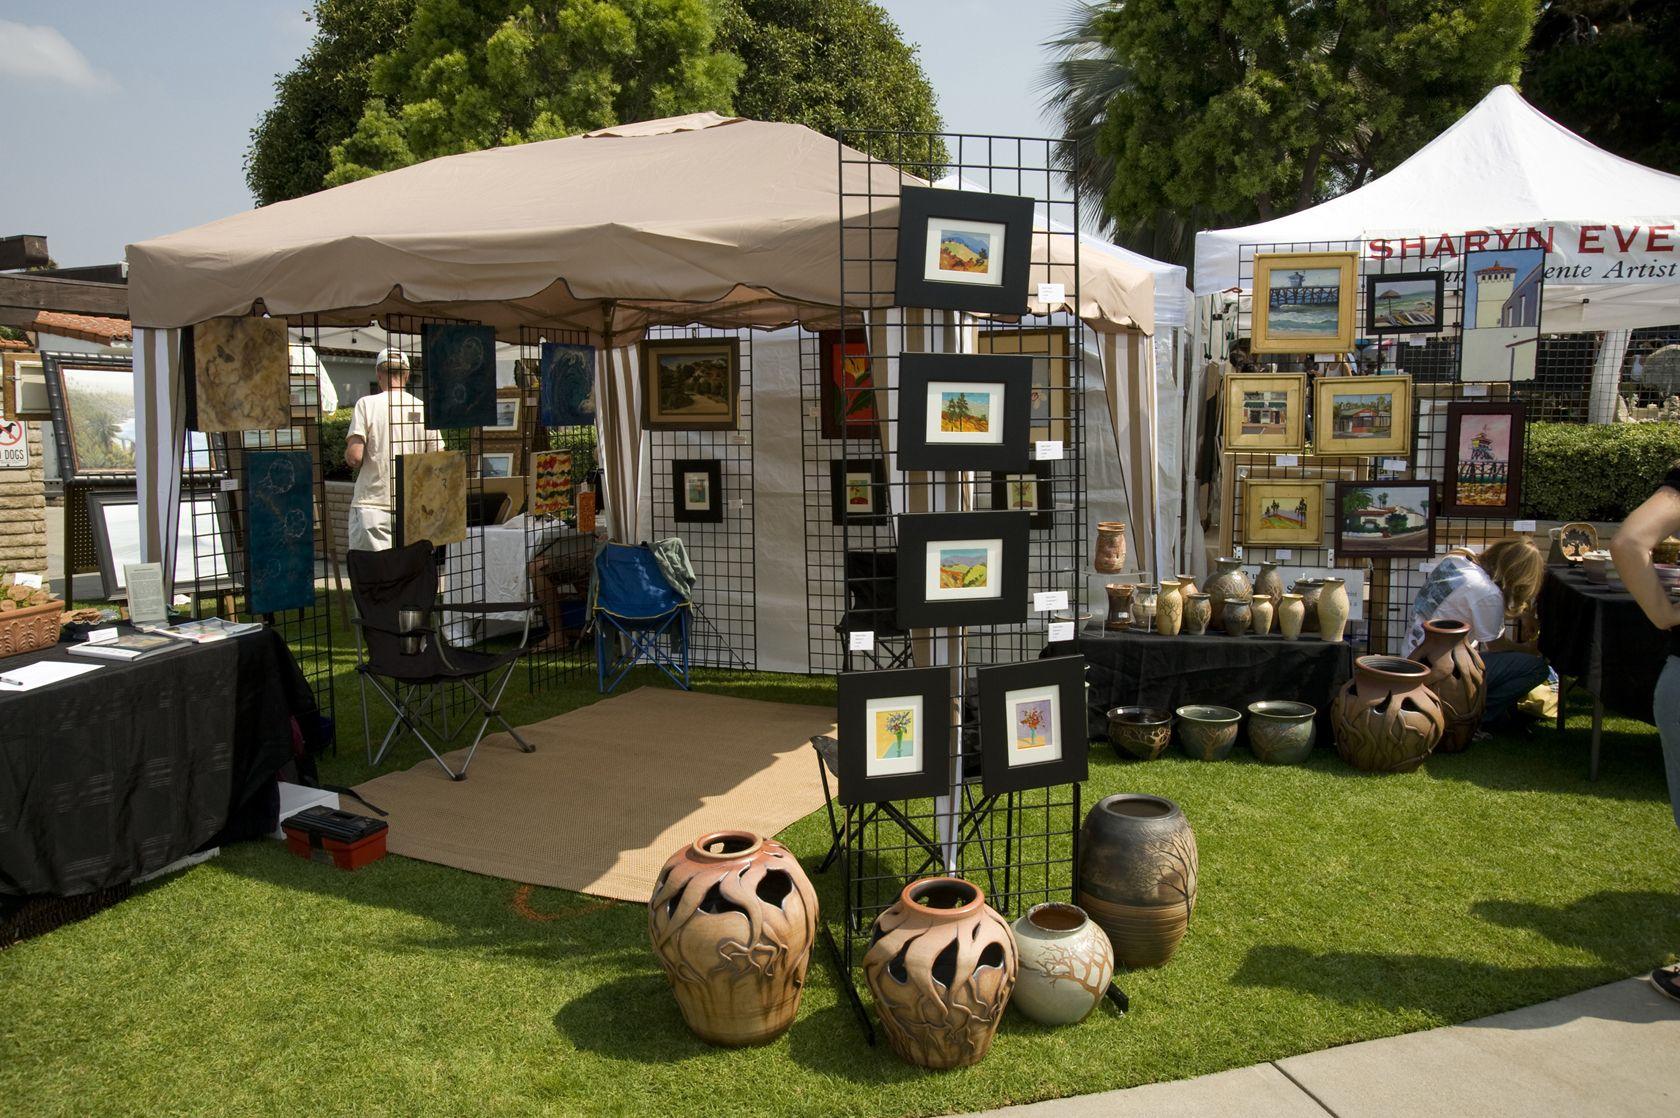 Arts And Crafts Fairs In Georgia